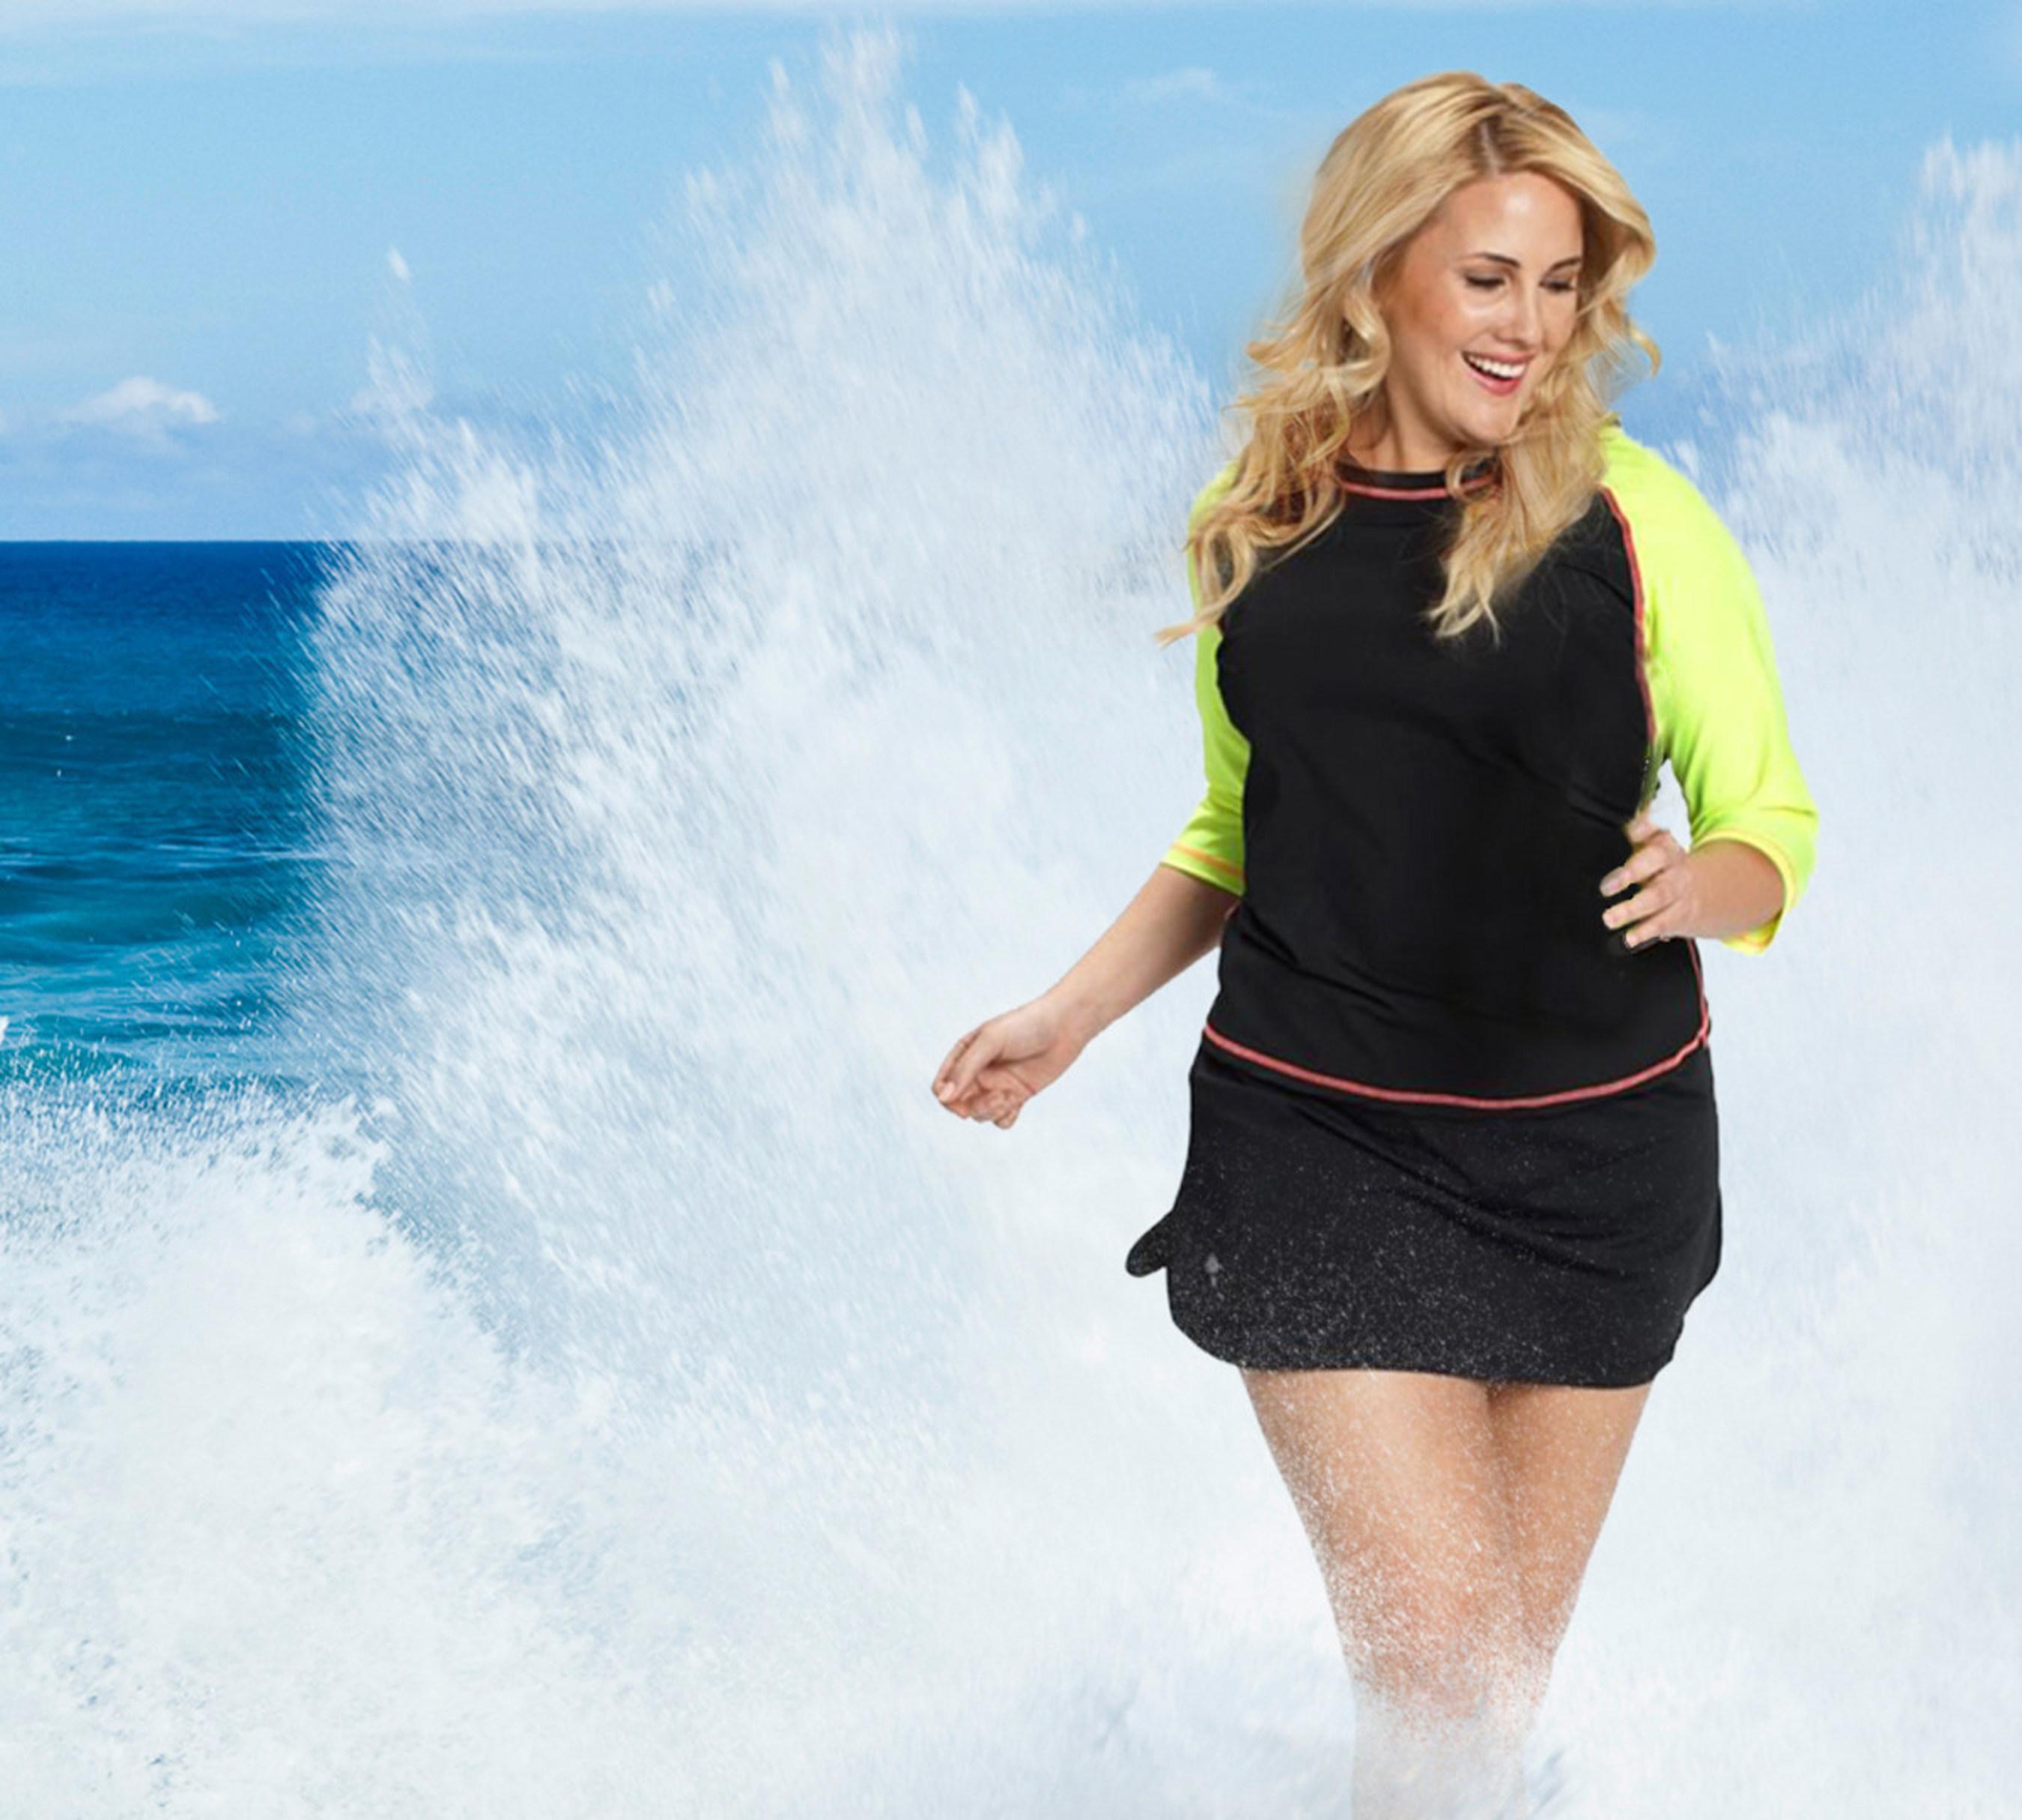 77b075a16bd HydroChic (www.hydroChic.com) offers customizable mix and match swimwear  and active